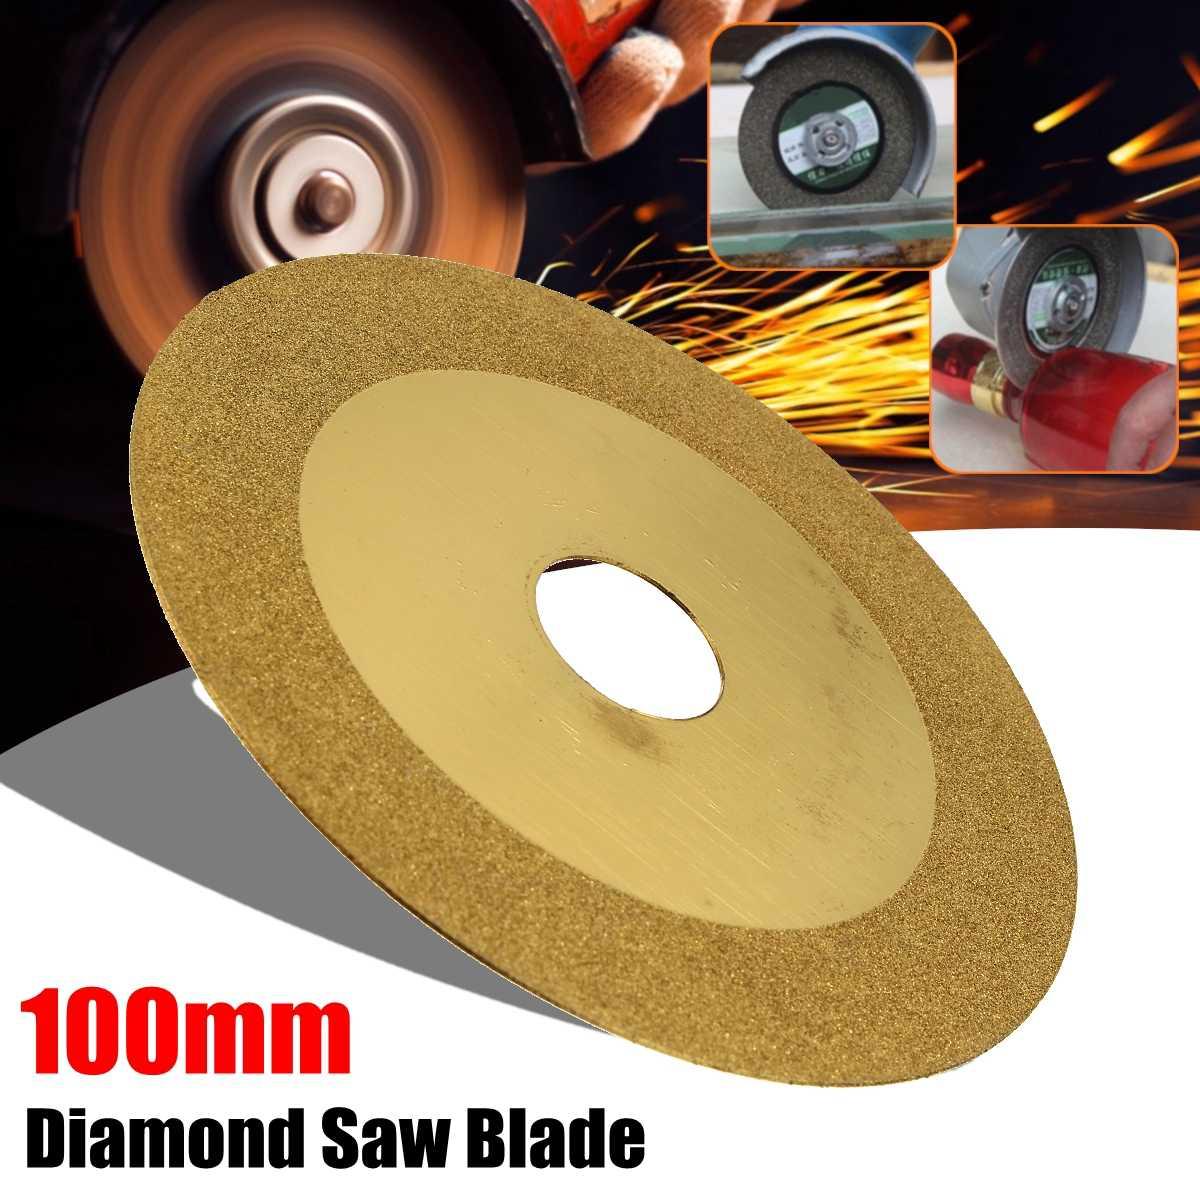 100x20mm Diamond Saw Blades Wheel Cutting Discs & Drill Bit For Dremel Rotary Tool Glass Metal Glass Stone